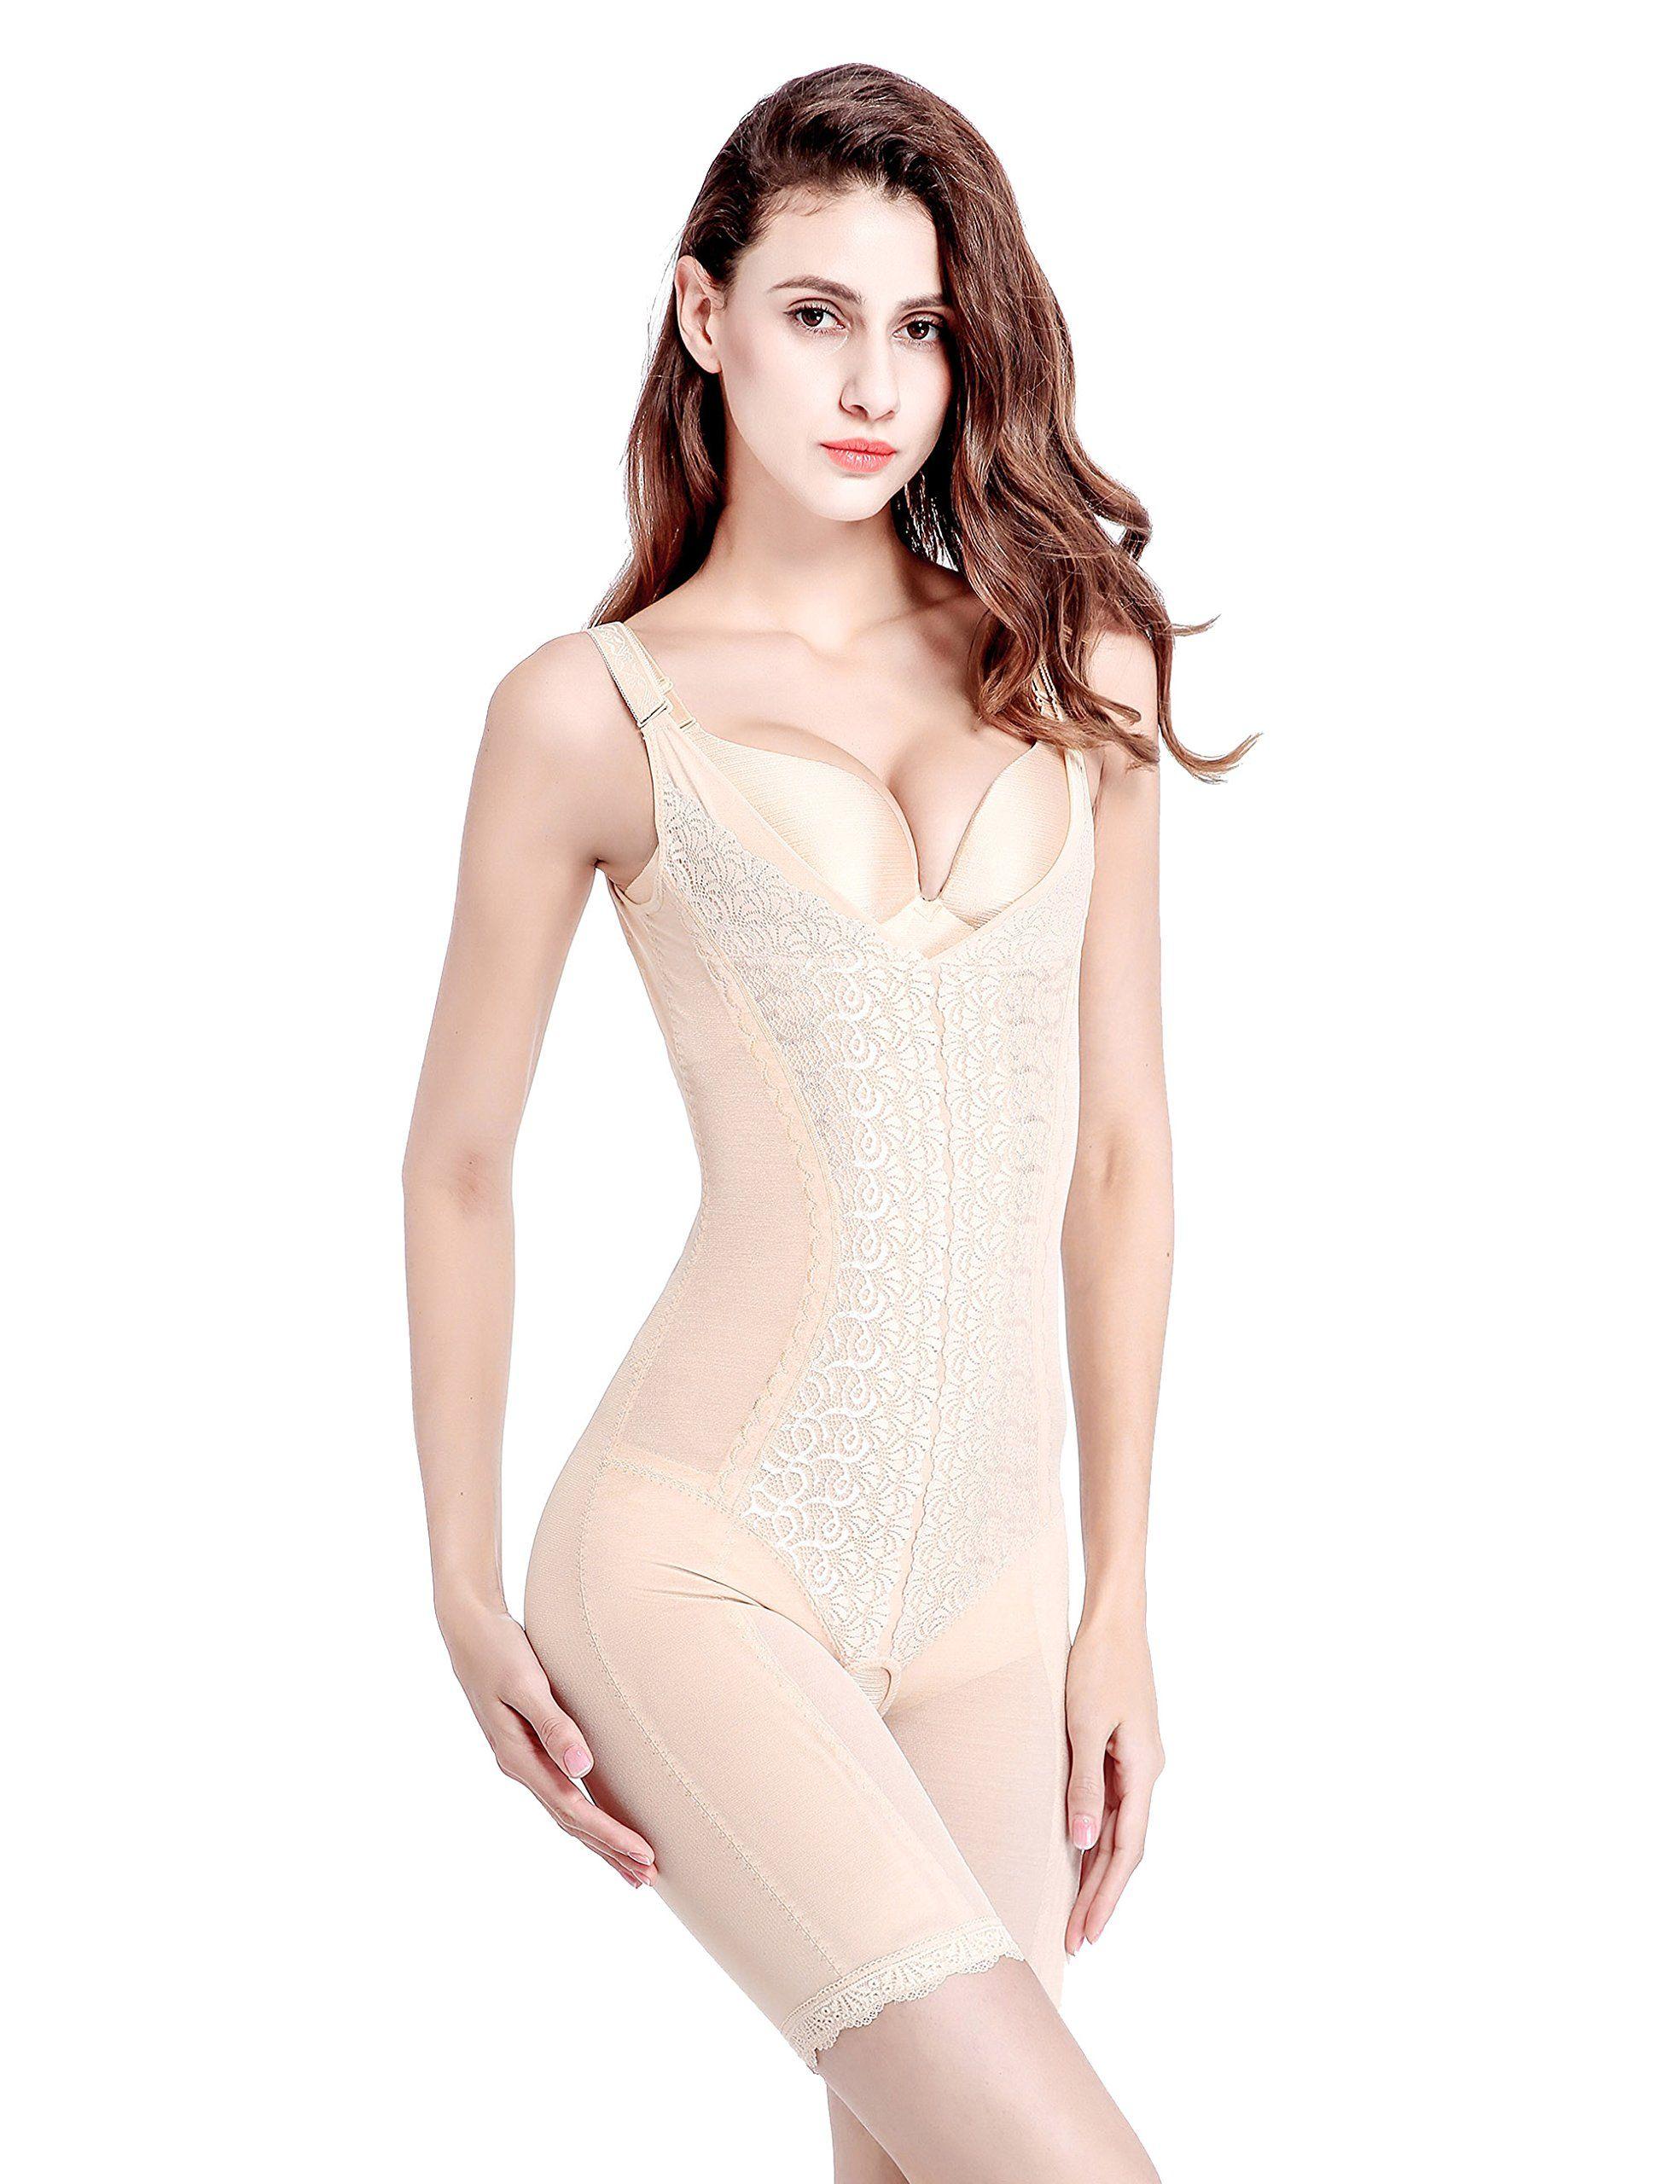 0e9960fccfe18 Sobefie Womens Full Body Shaper Firm Control Slimming Bodysuits Shapewear  Breathable Skin     Check